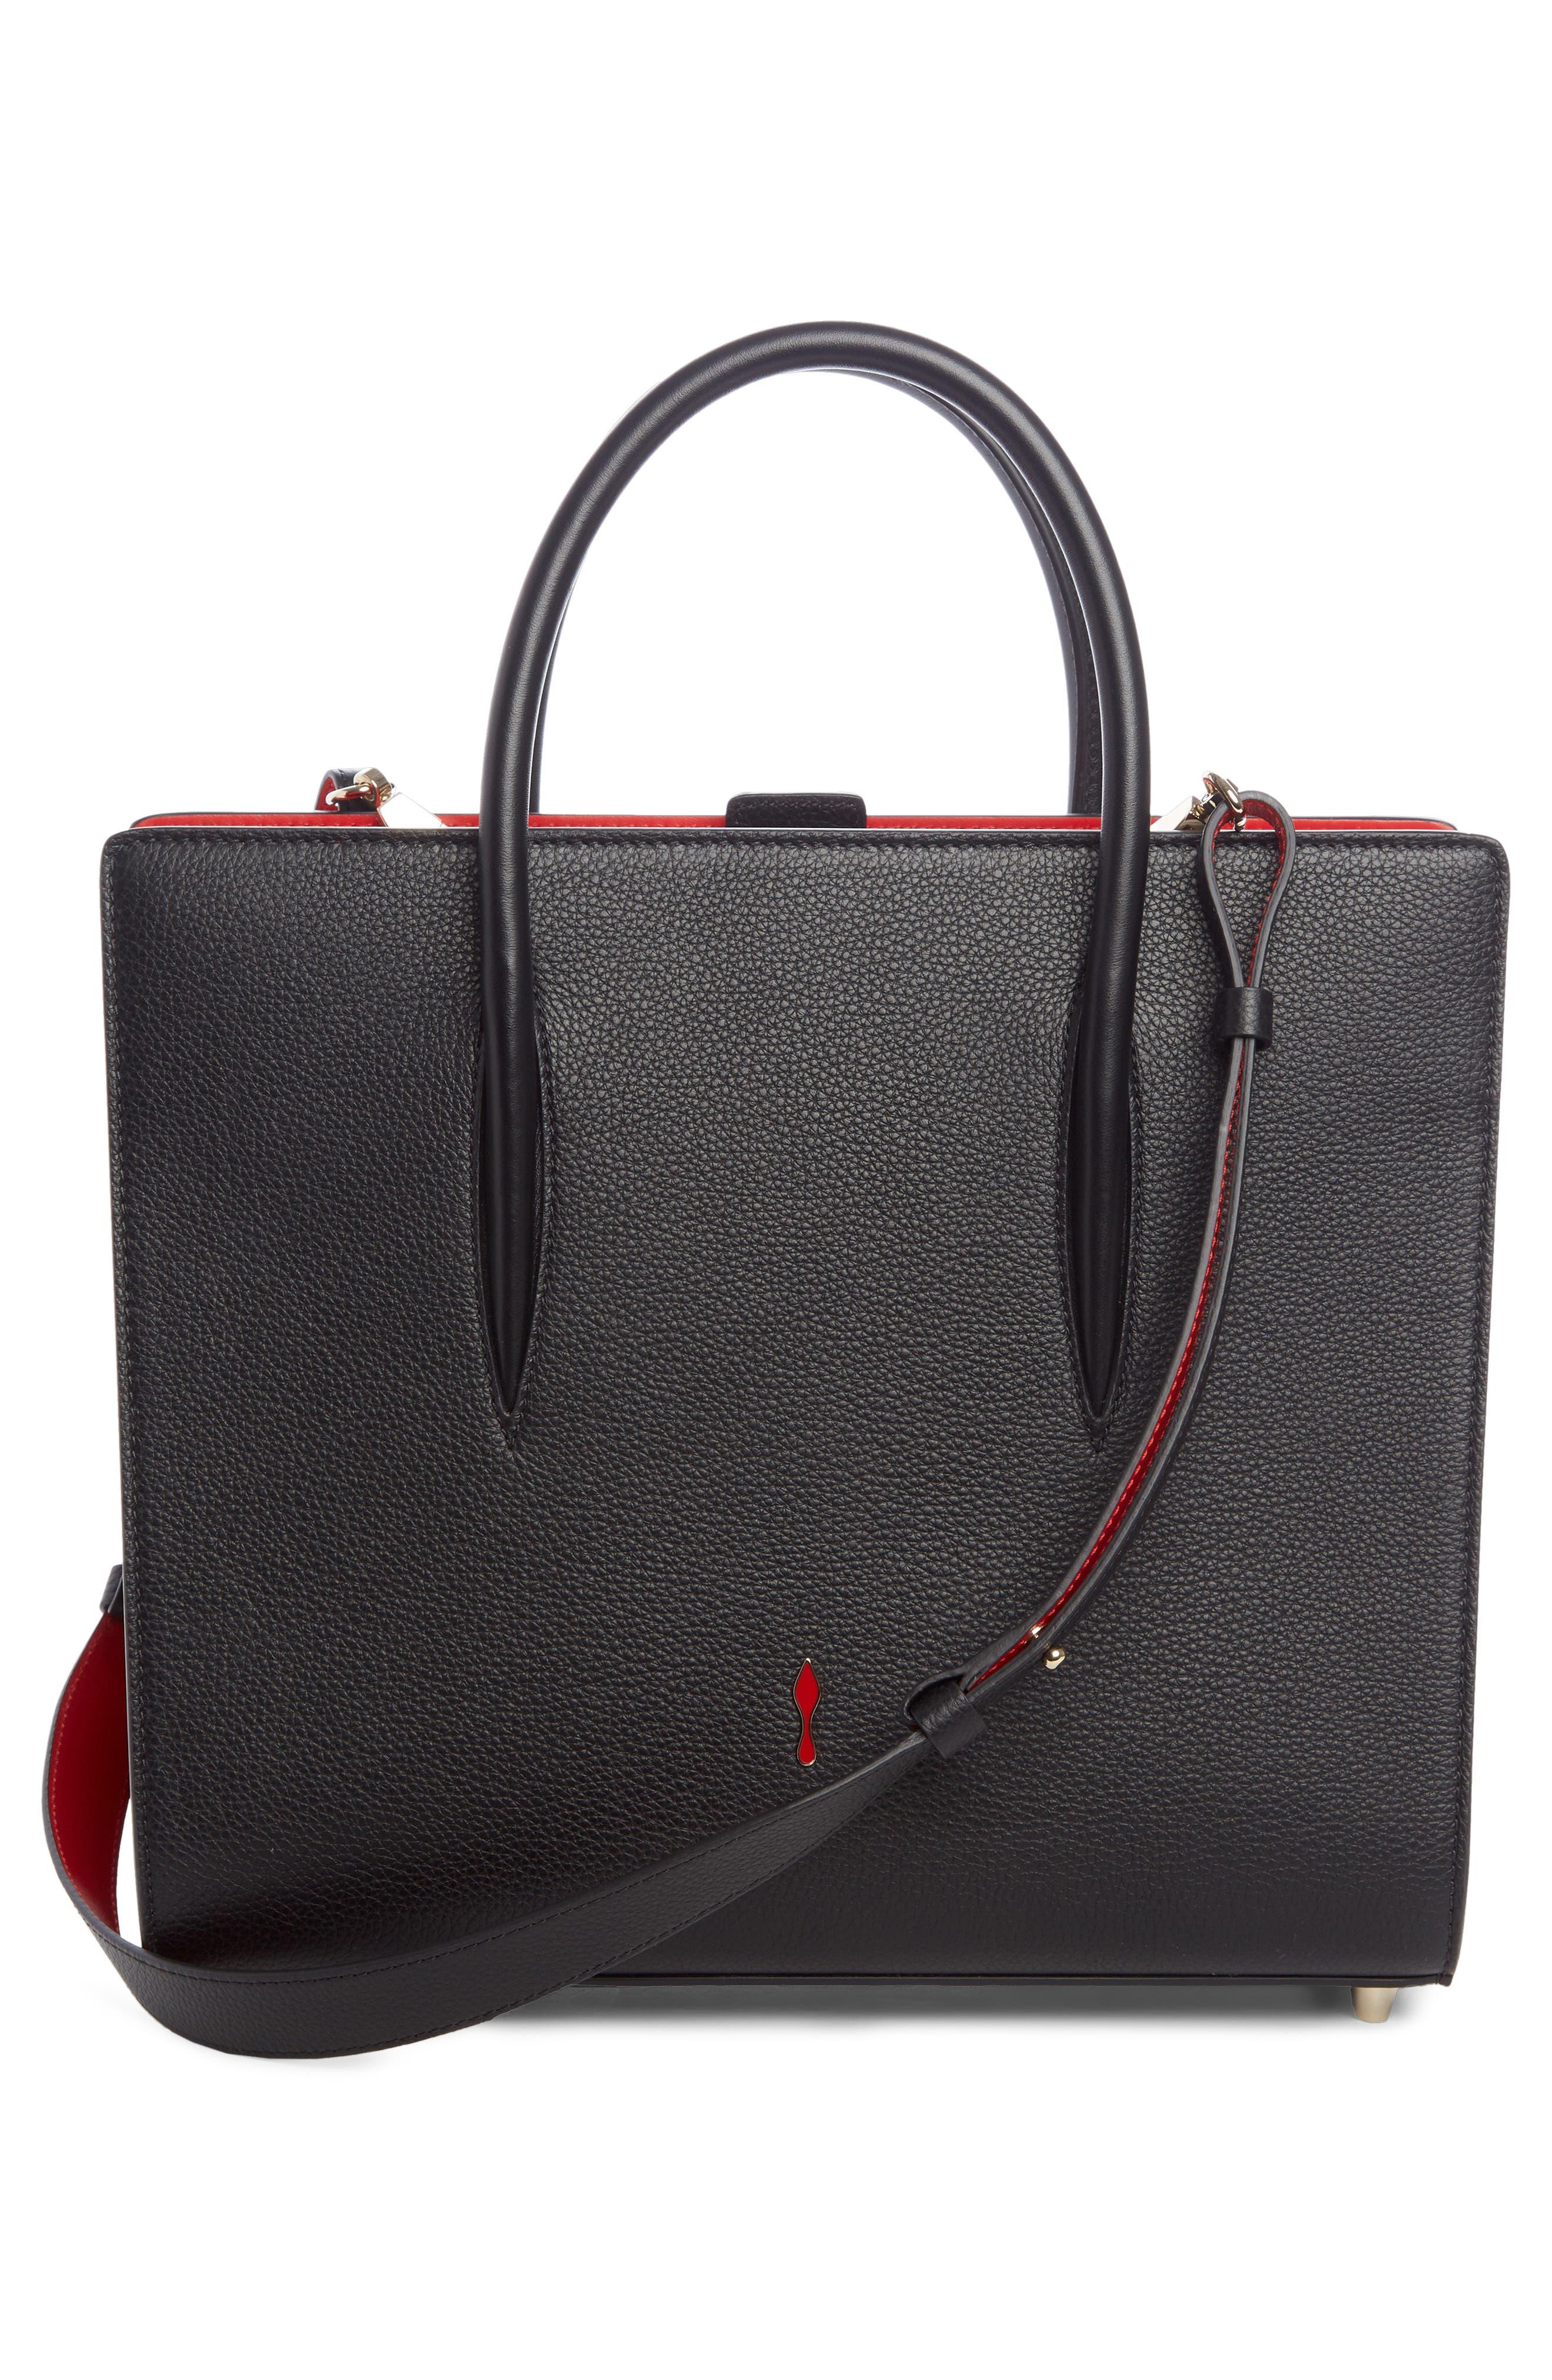 Medium Paloma Leather Tote,                             Alternate thumbnail 2, color,                             Black/ Red-Gold